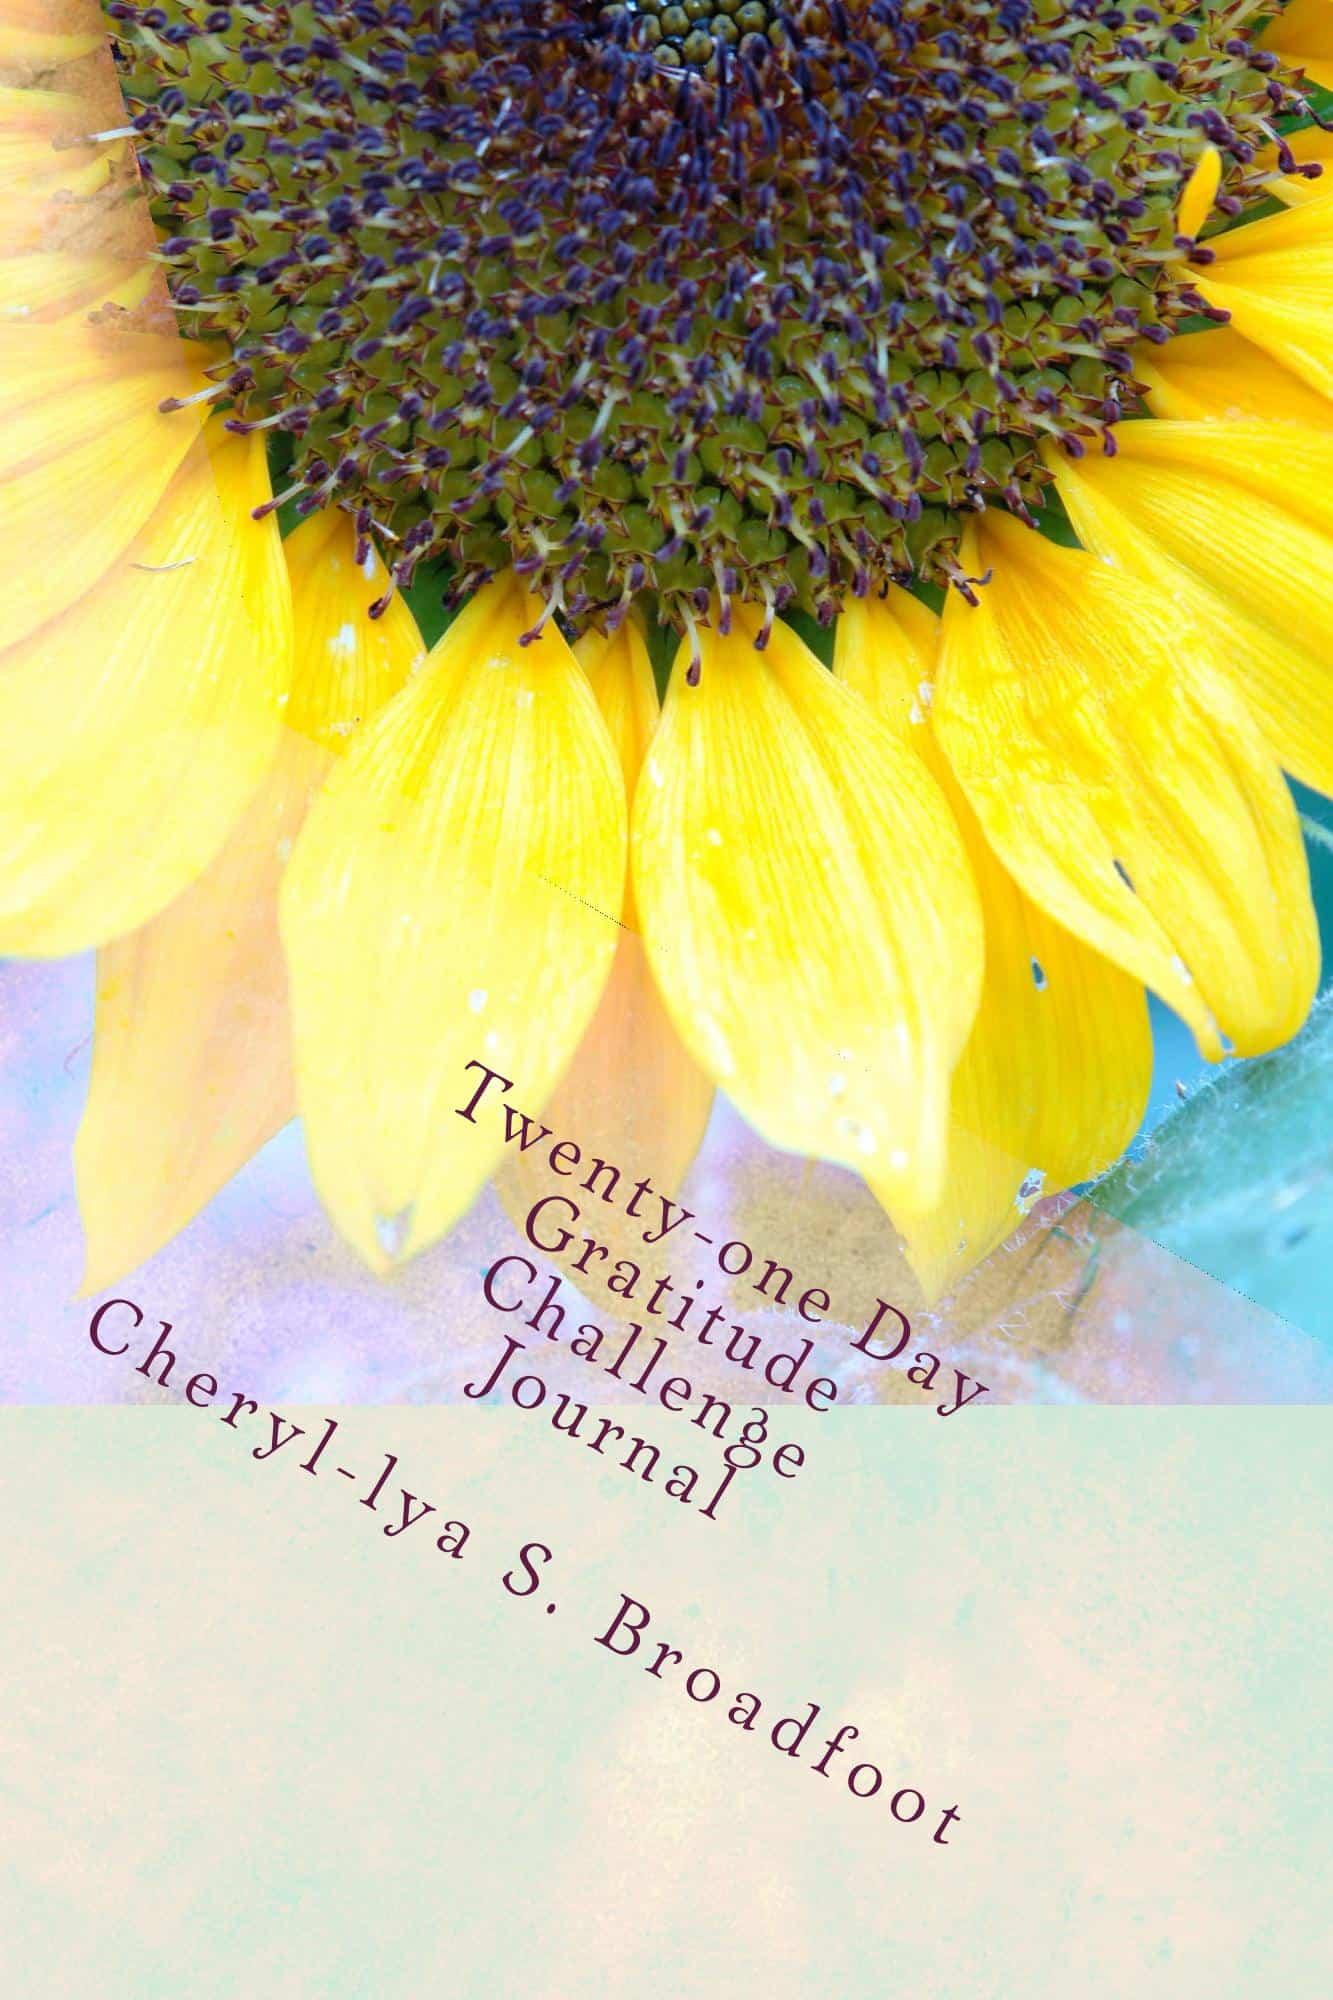 Twentyone_Day_Grati_Cover_for_Kindle